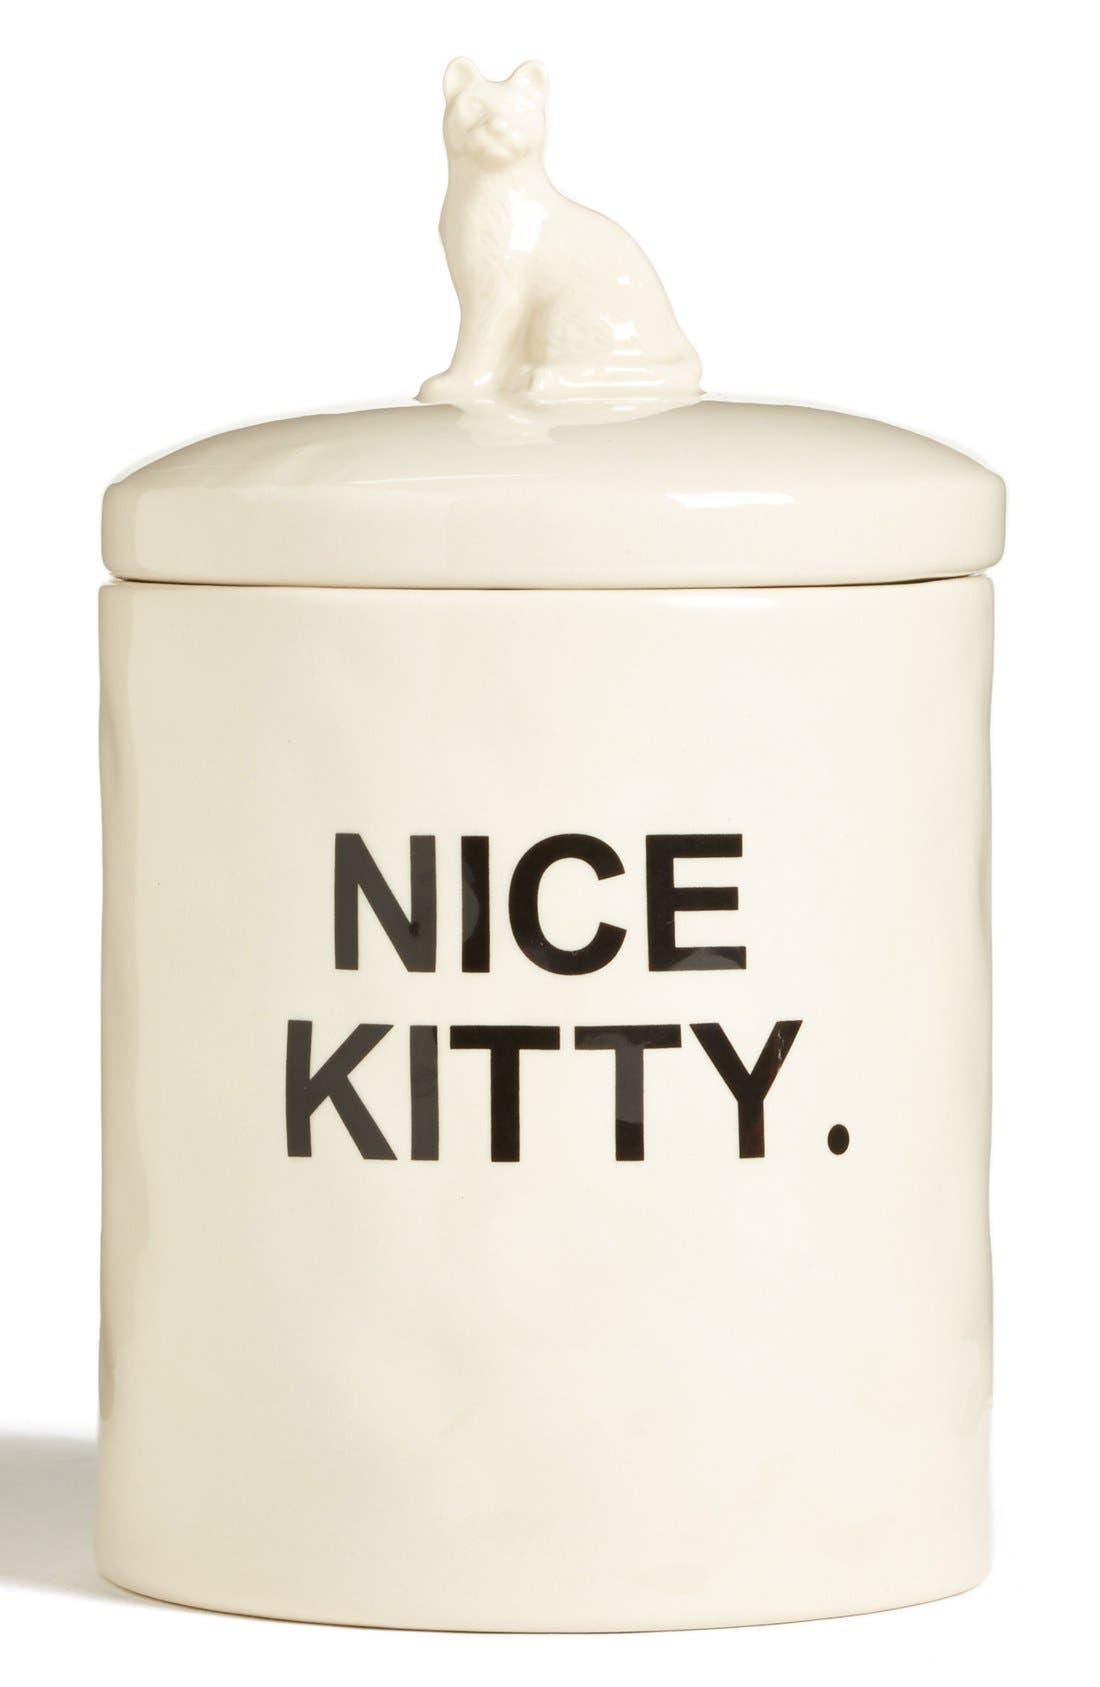 'Fred' Cat Treat Jar,                             Main thumbnail 1, color,                             100